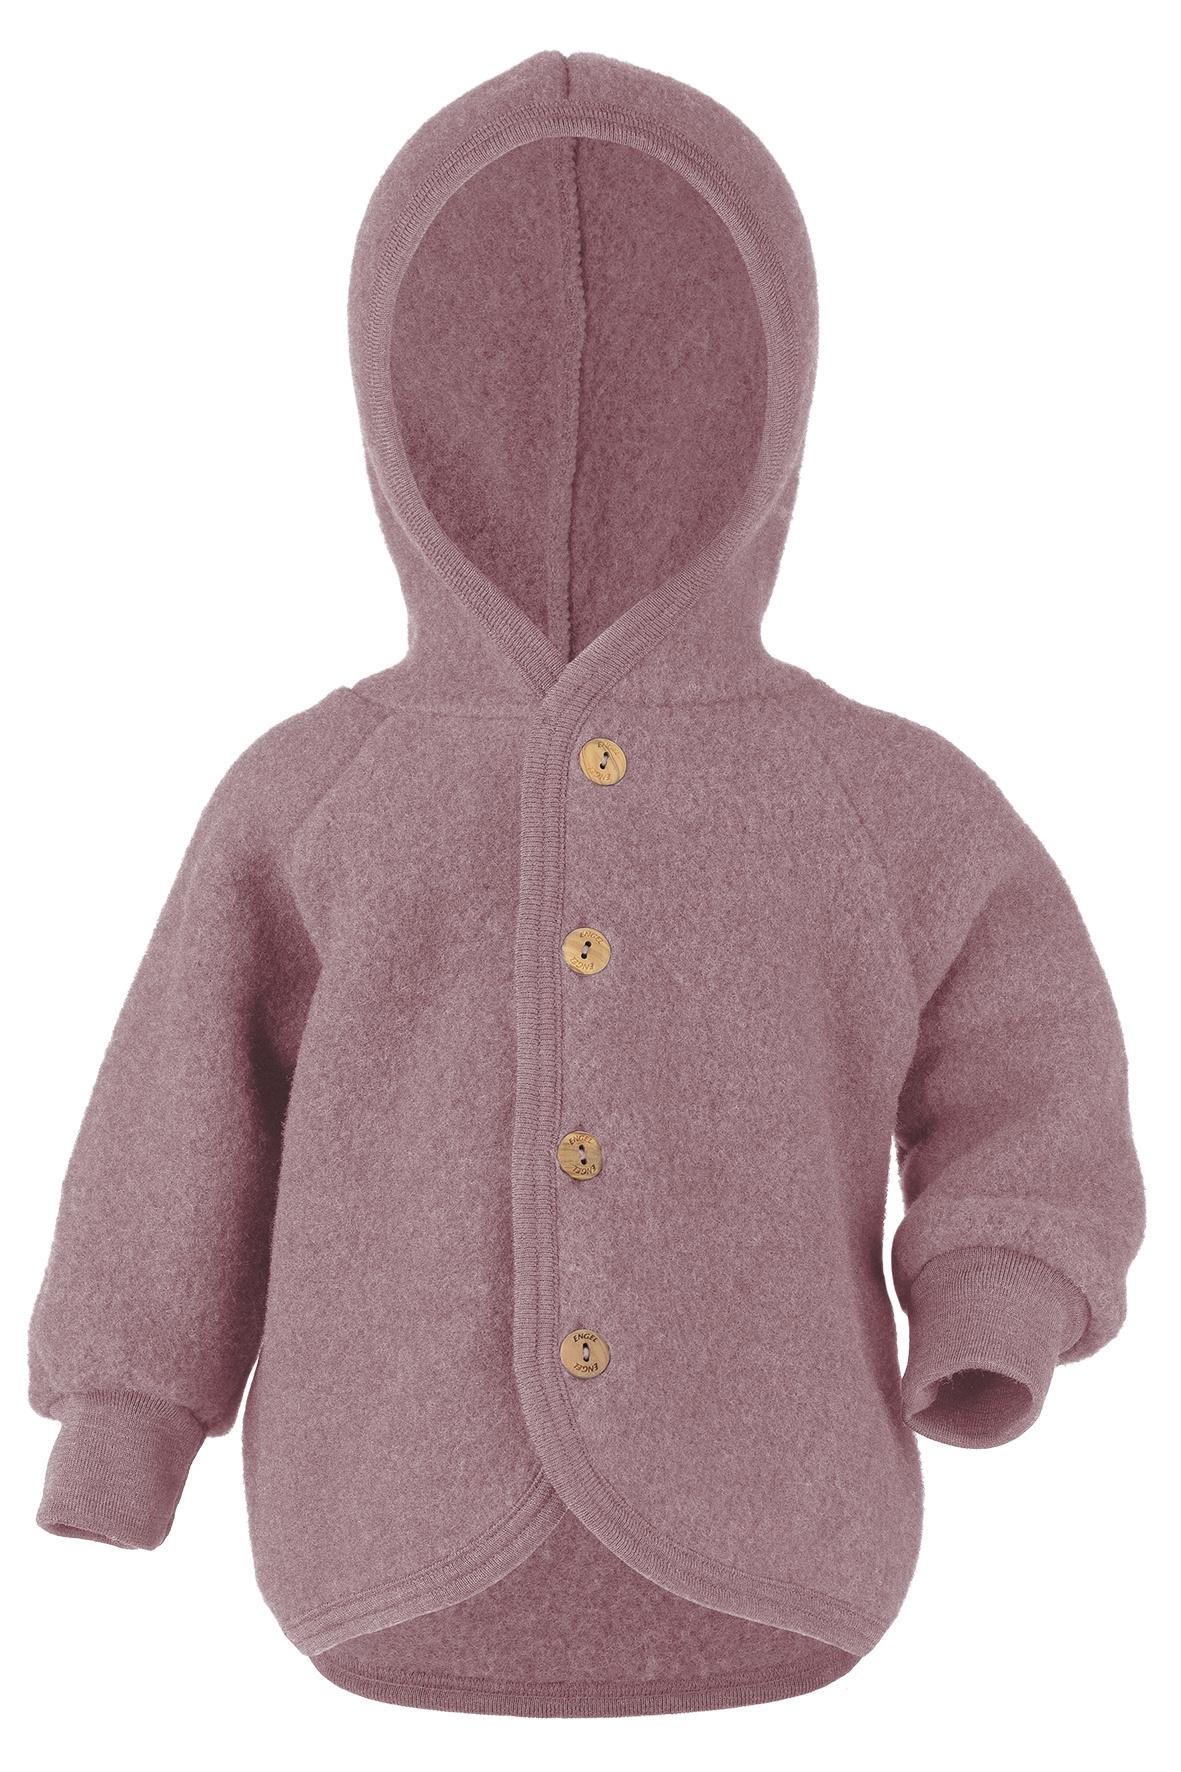 Hooded vest - Rosewood-1